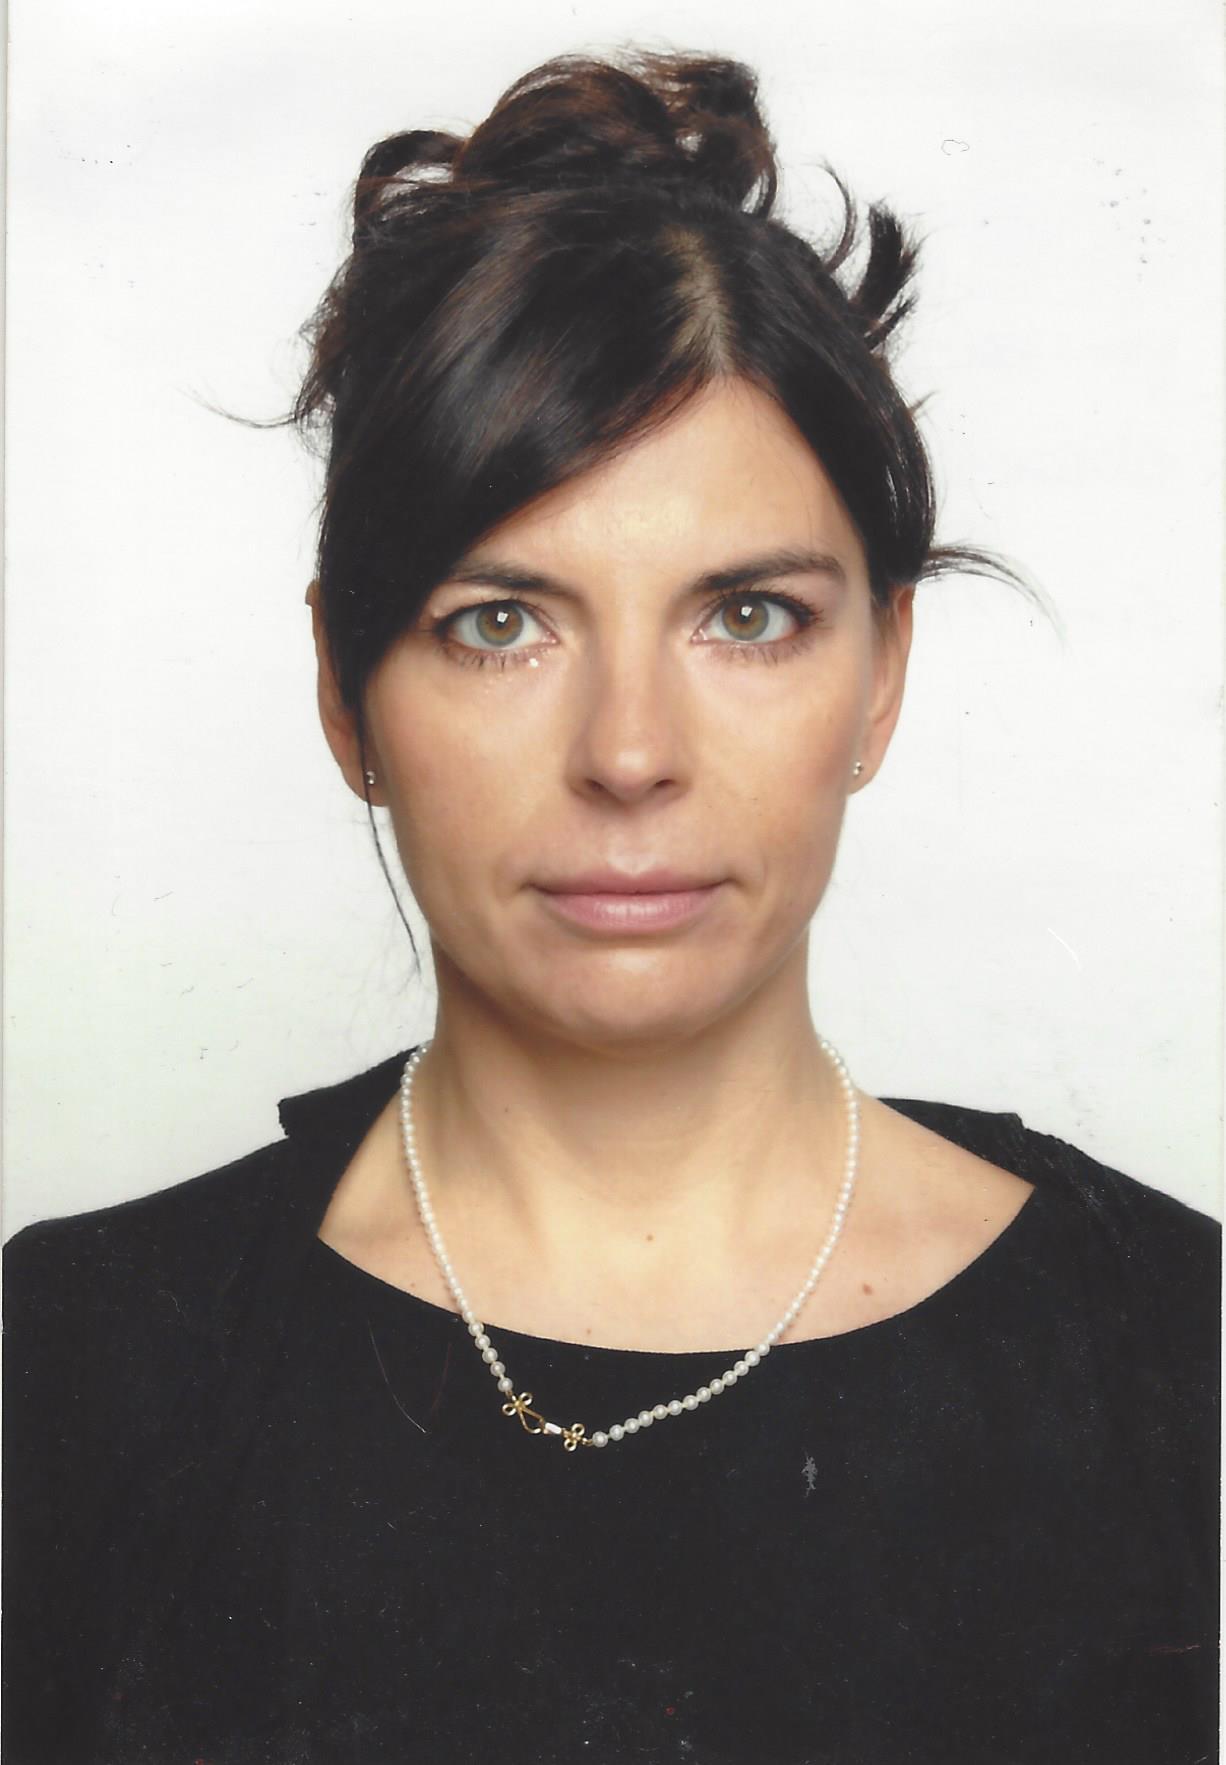 Paola Cudia